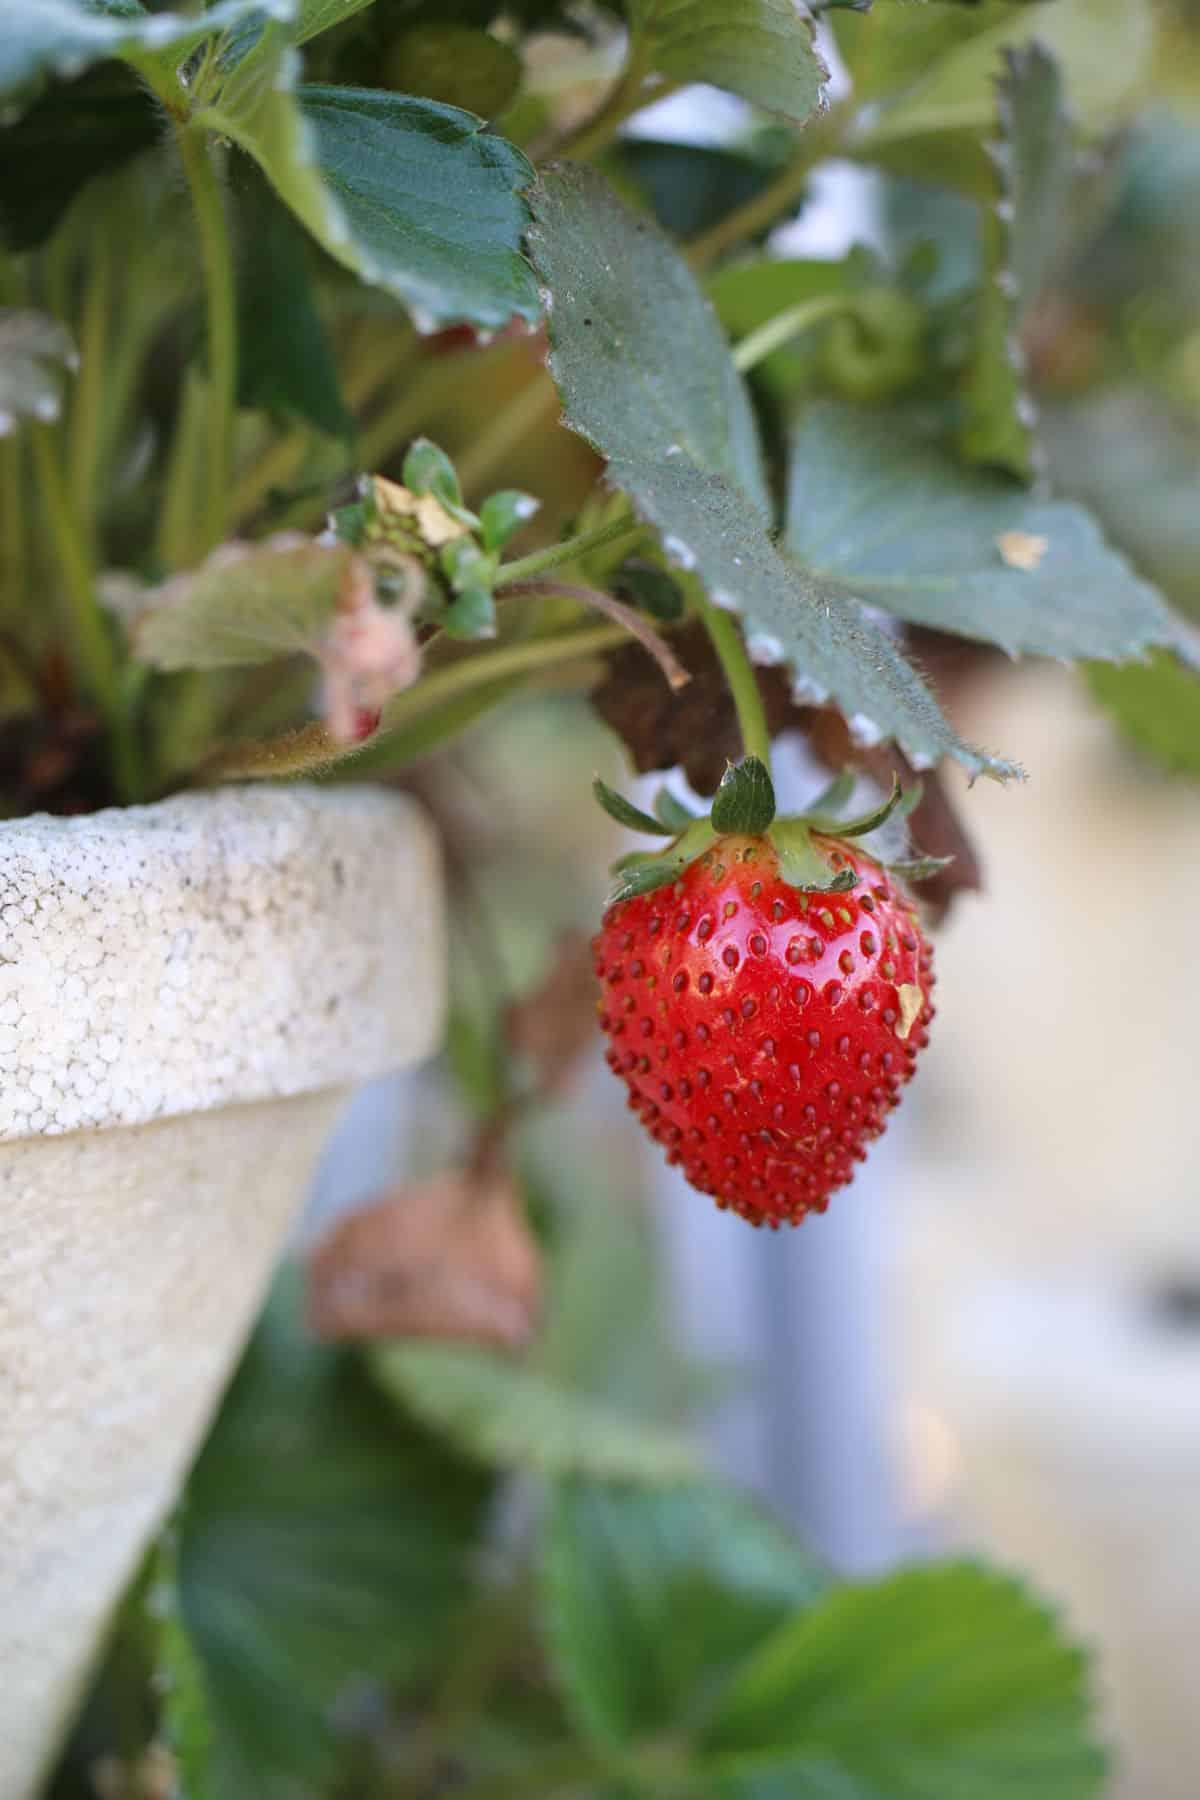 A single strawberry on a plant